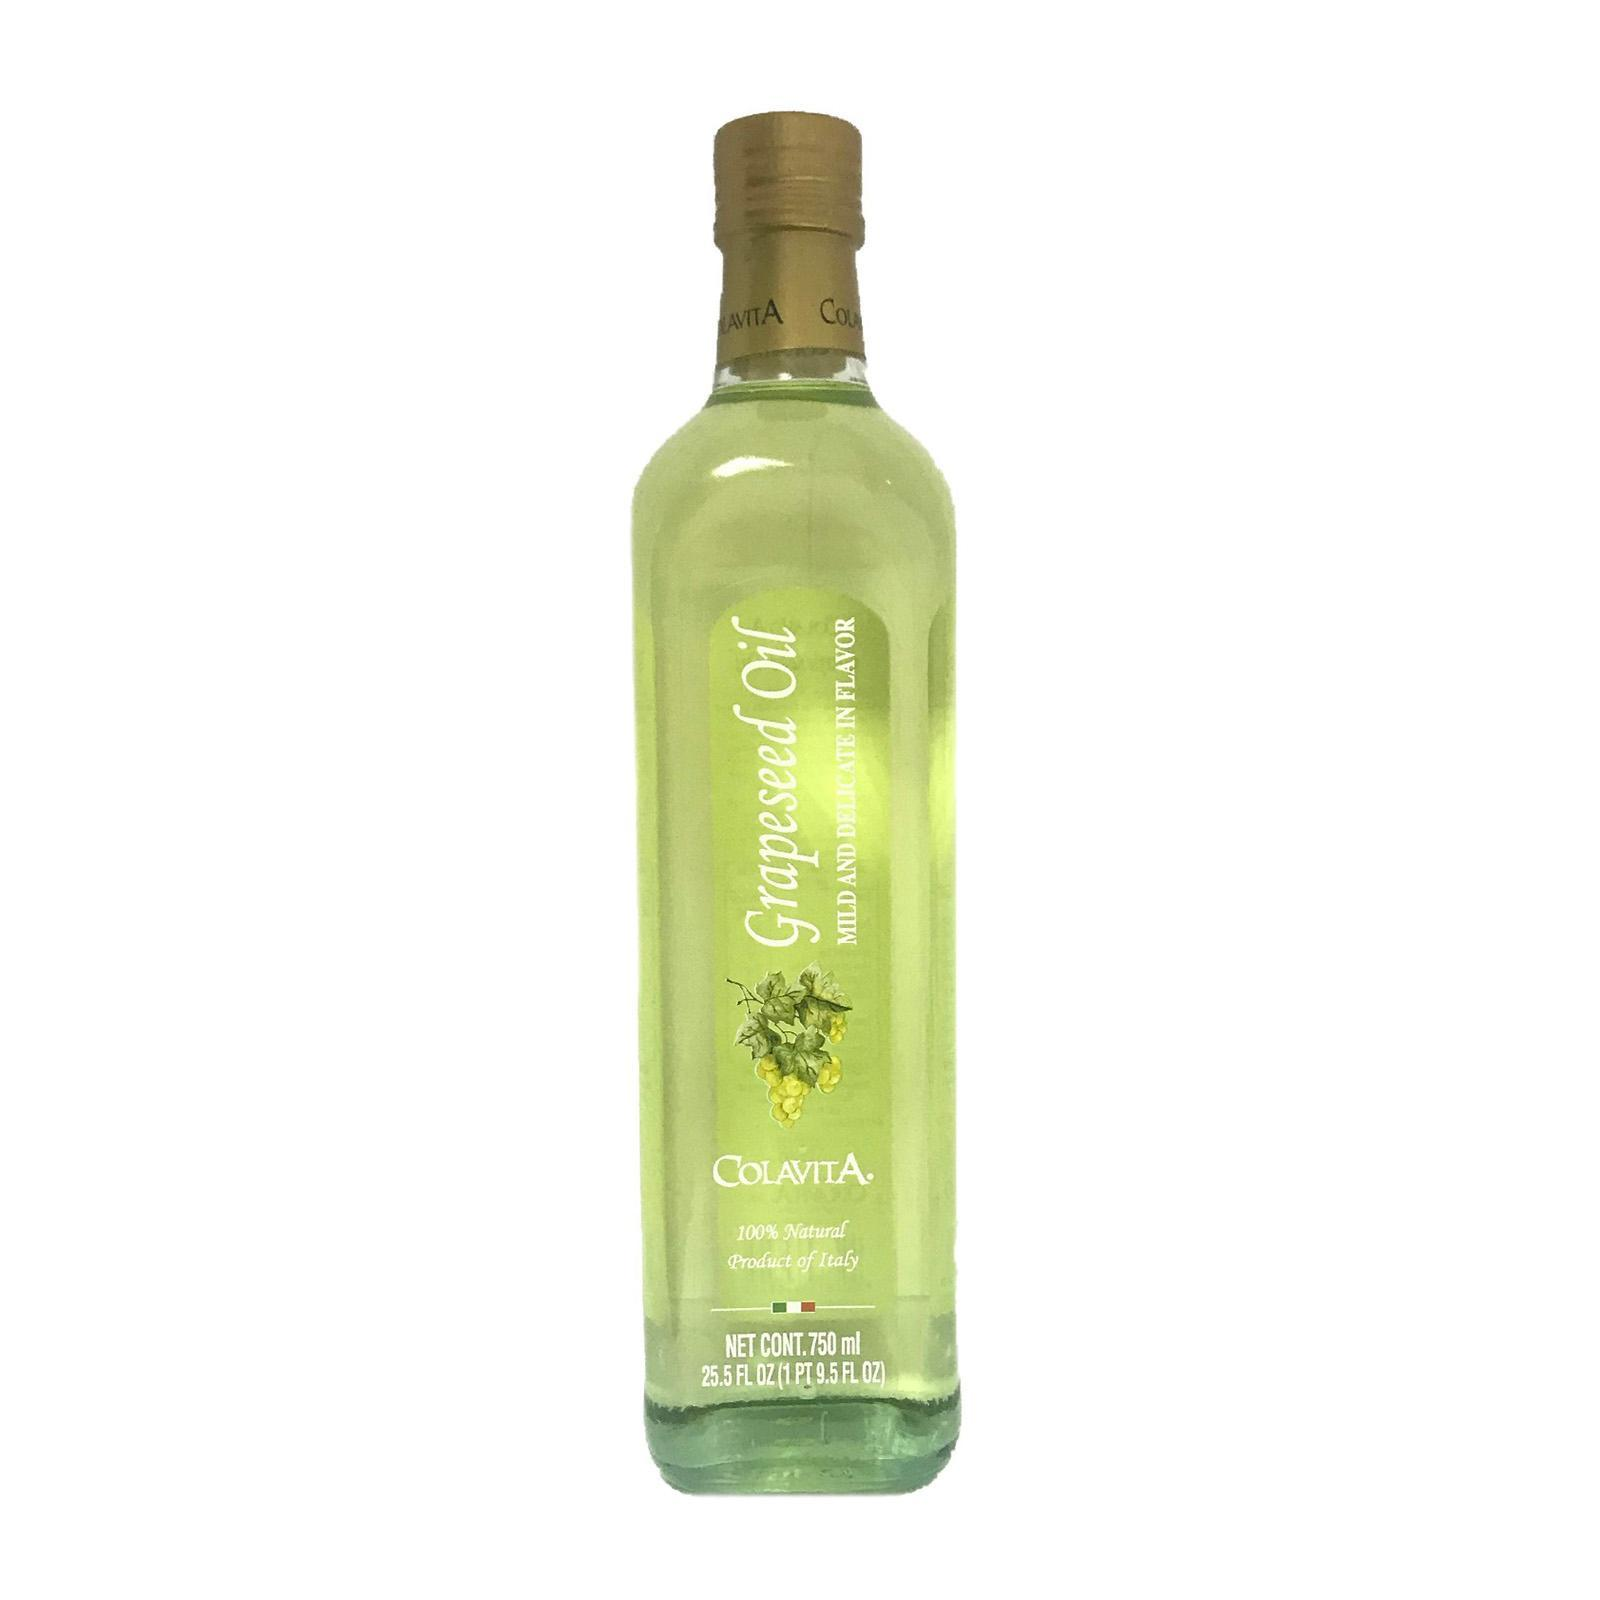 Colavita 100 - percent Grapeseed Oil